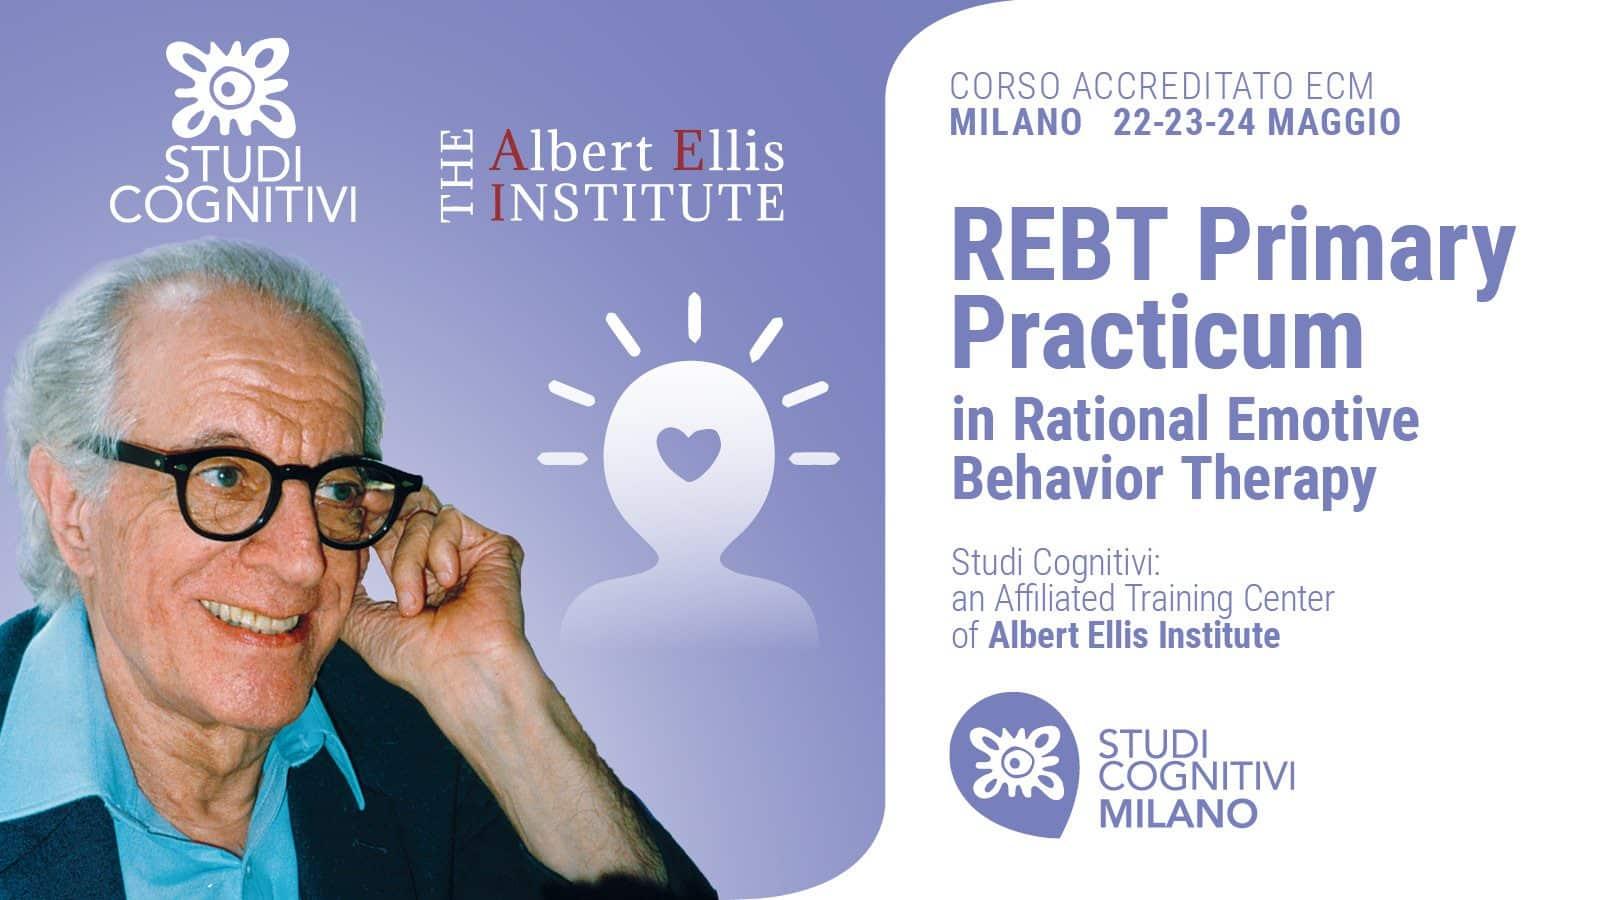 Primary Practicum in Rational Emotive Behavioral Therapy (REBT) - Milano, dal 22 al 24 Maggio 2020